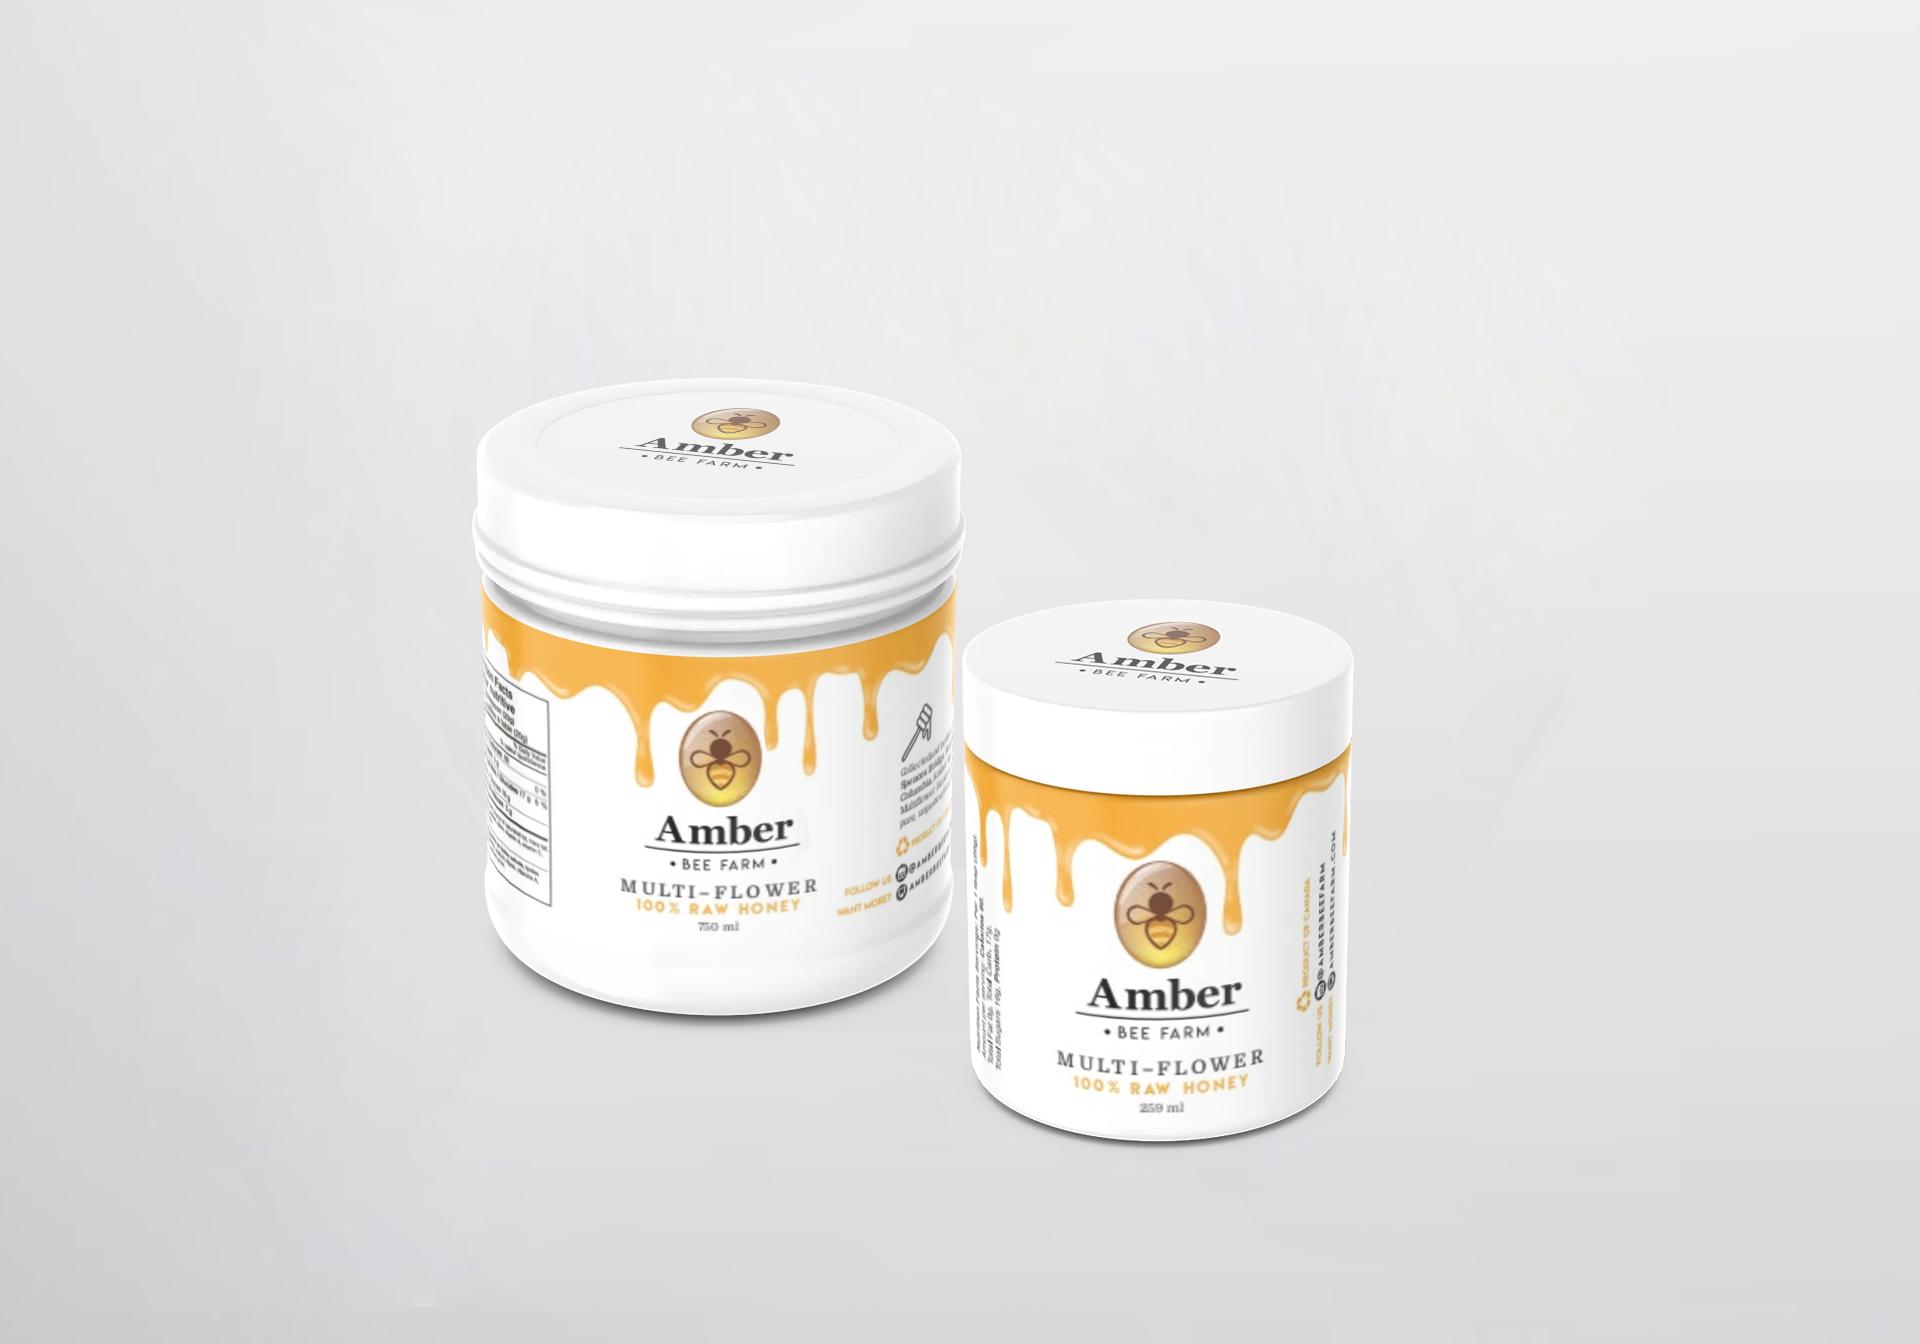 Amber Bee Farm